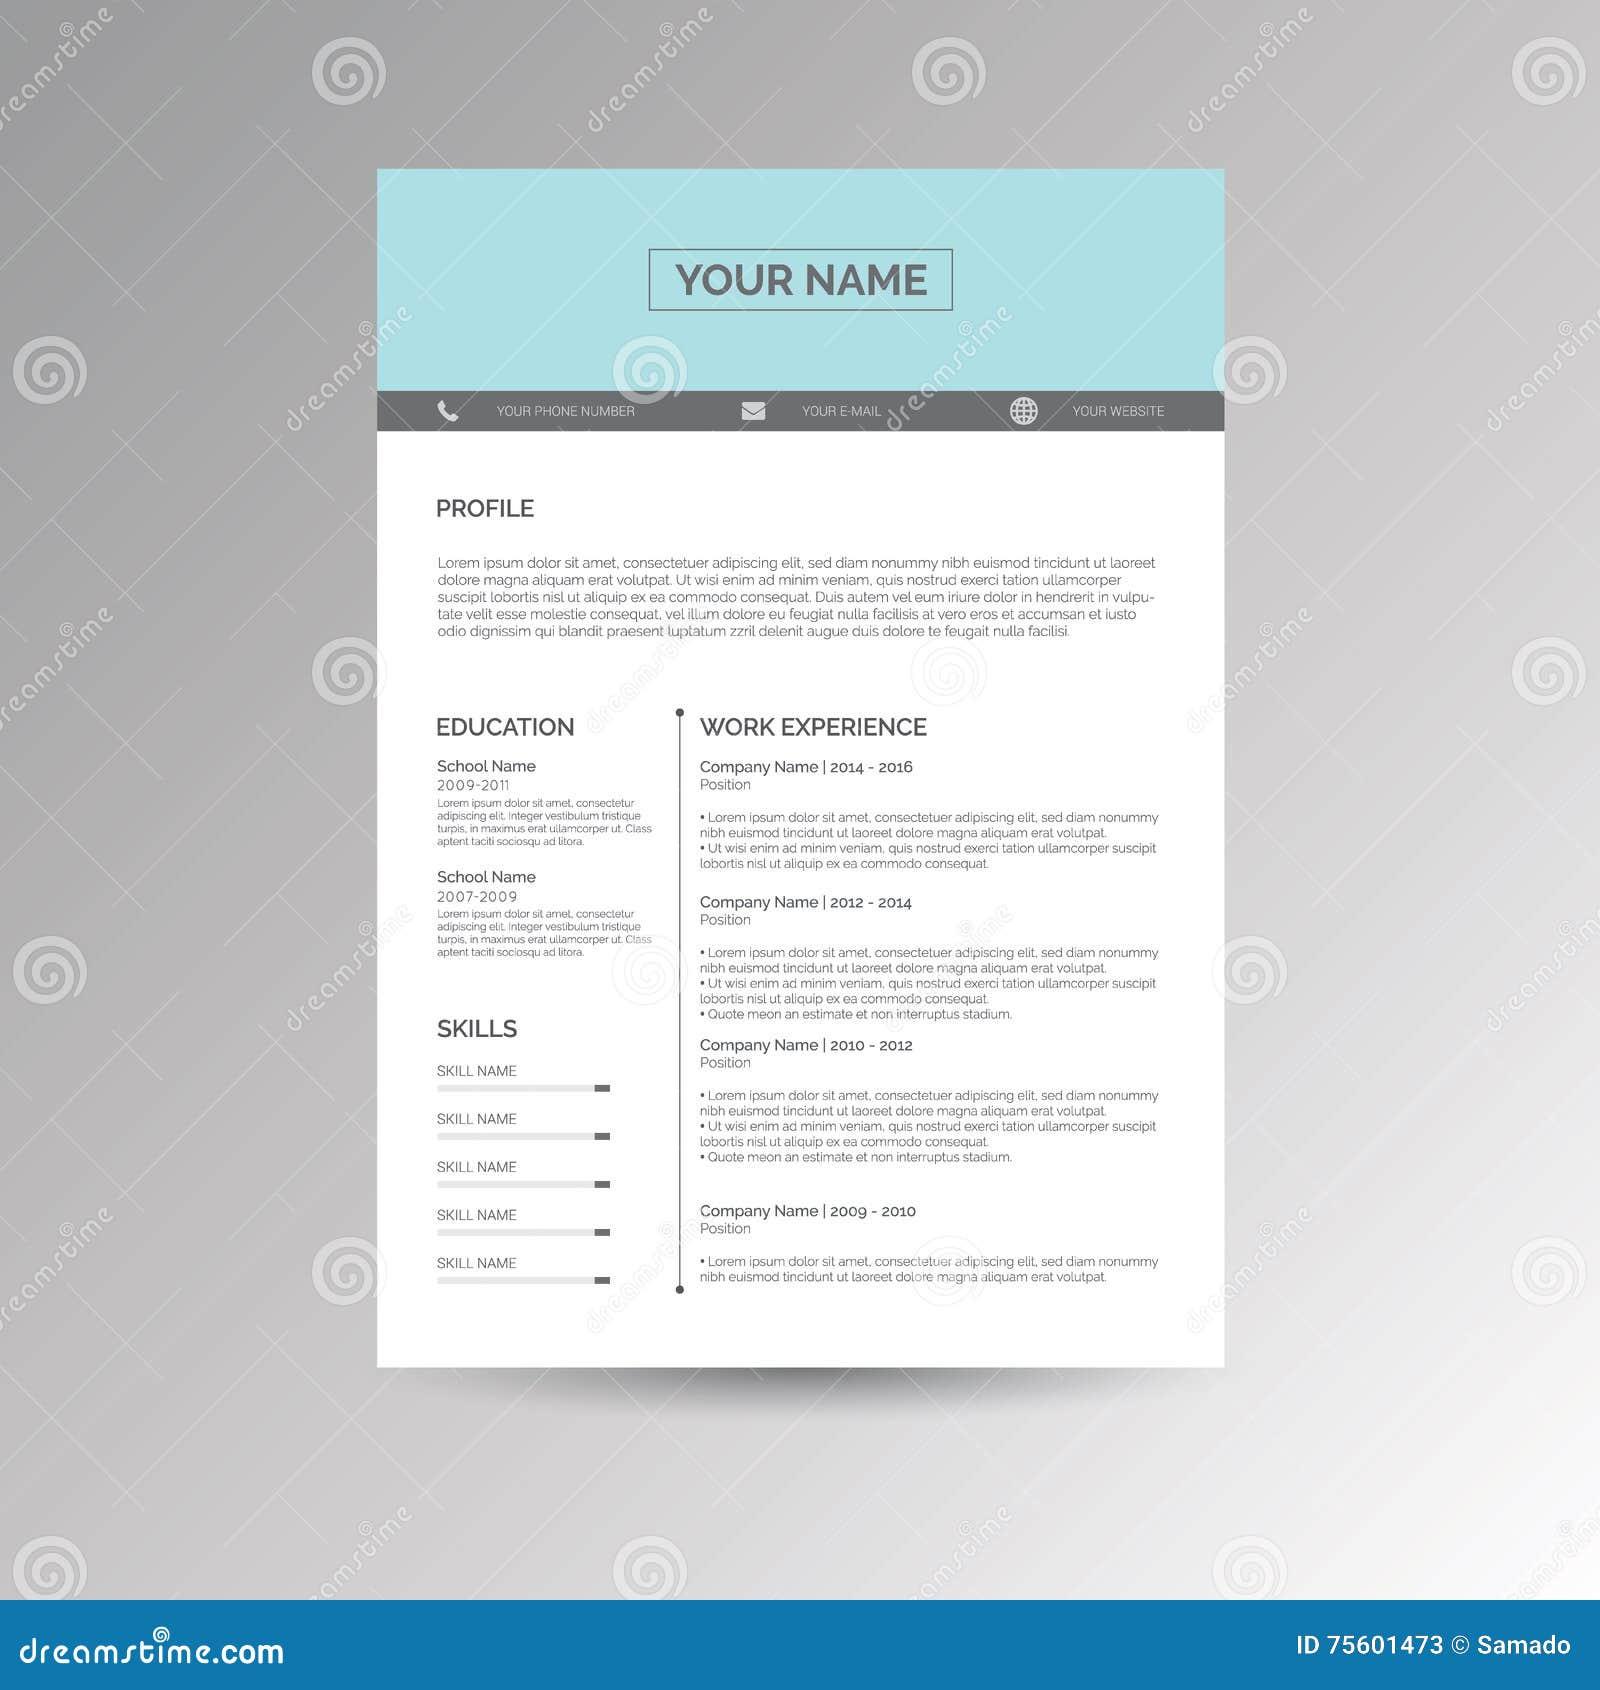 Cv Resume Template Stock Vector Illustration Of Work 75601473